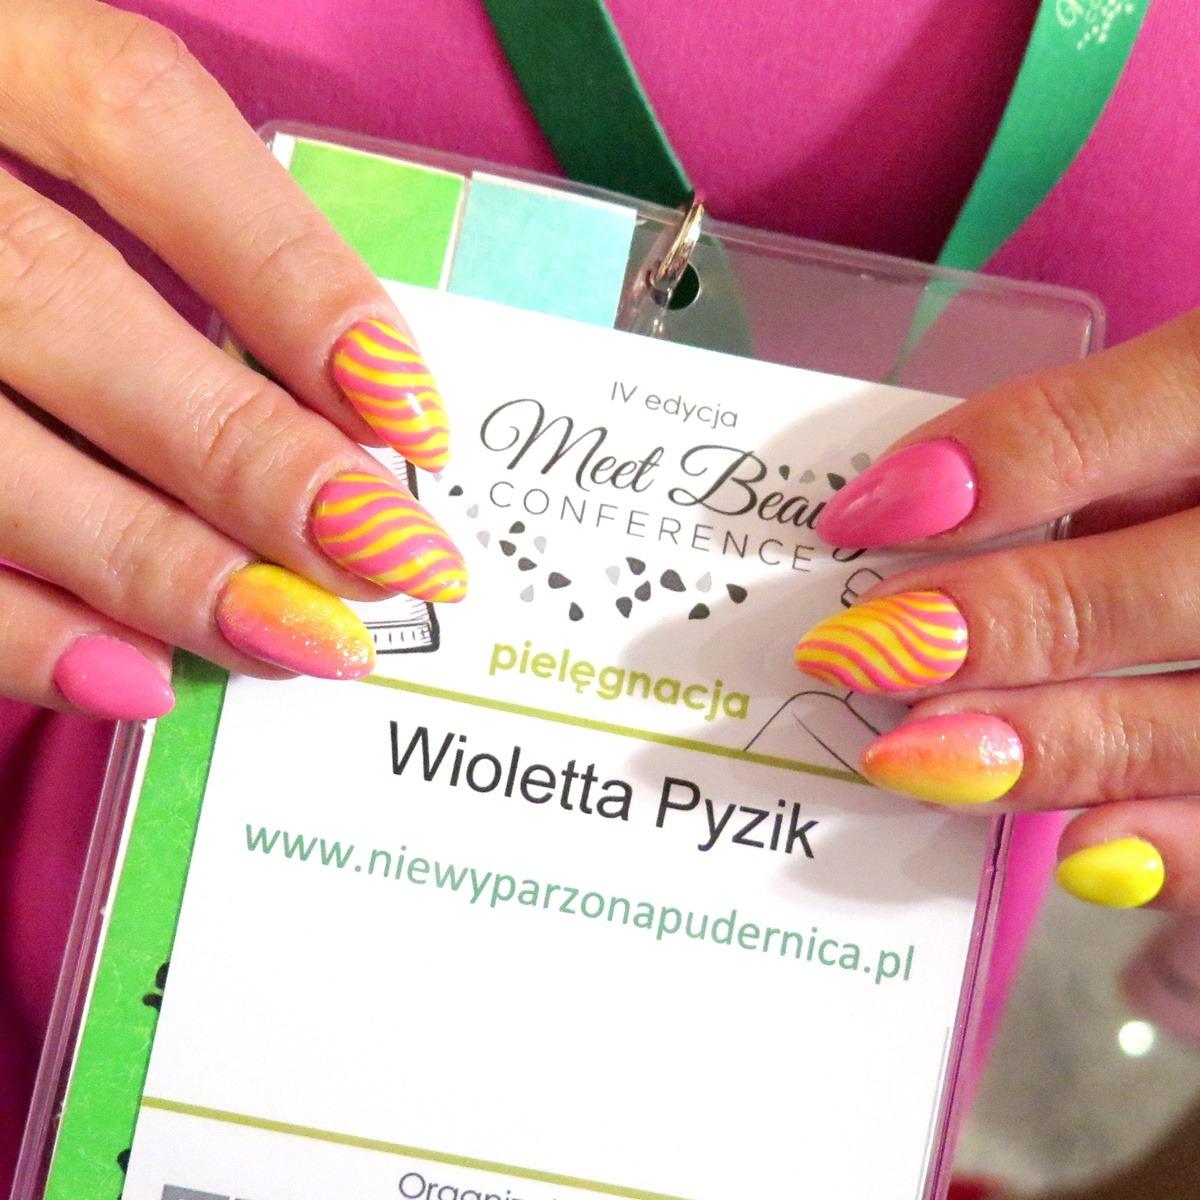 niewyparzona pudernica blogerka wioletta pyzik